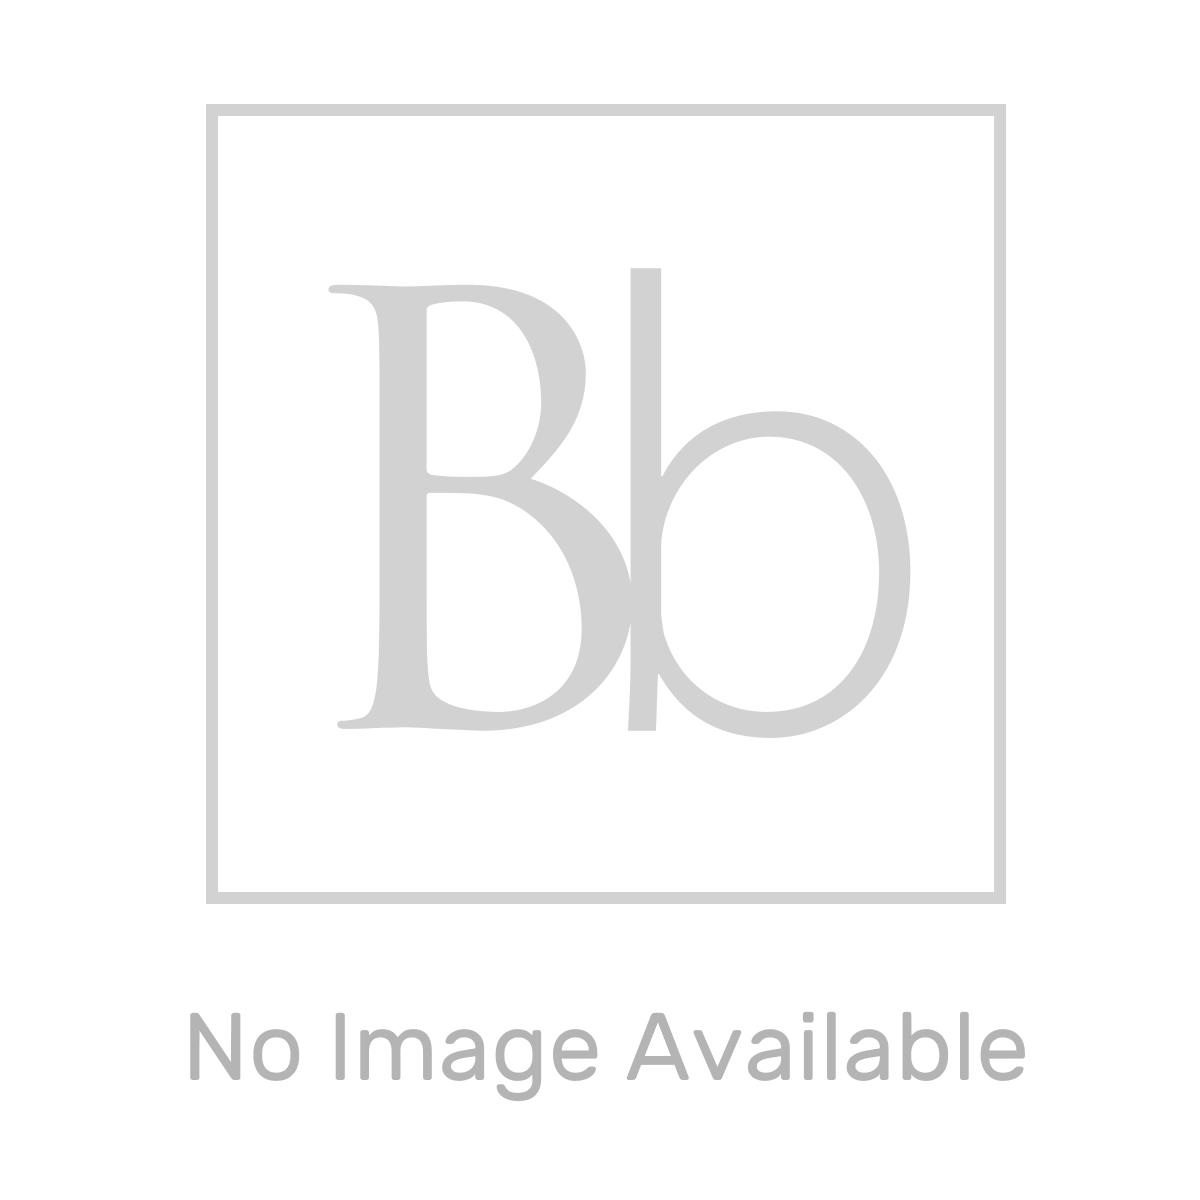 Elation Ikoma Bodega Grey Mirror 550mm Dimensions